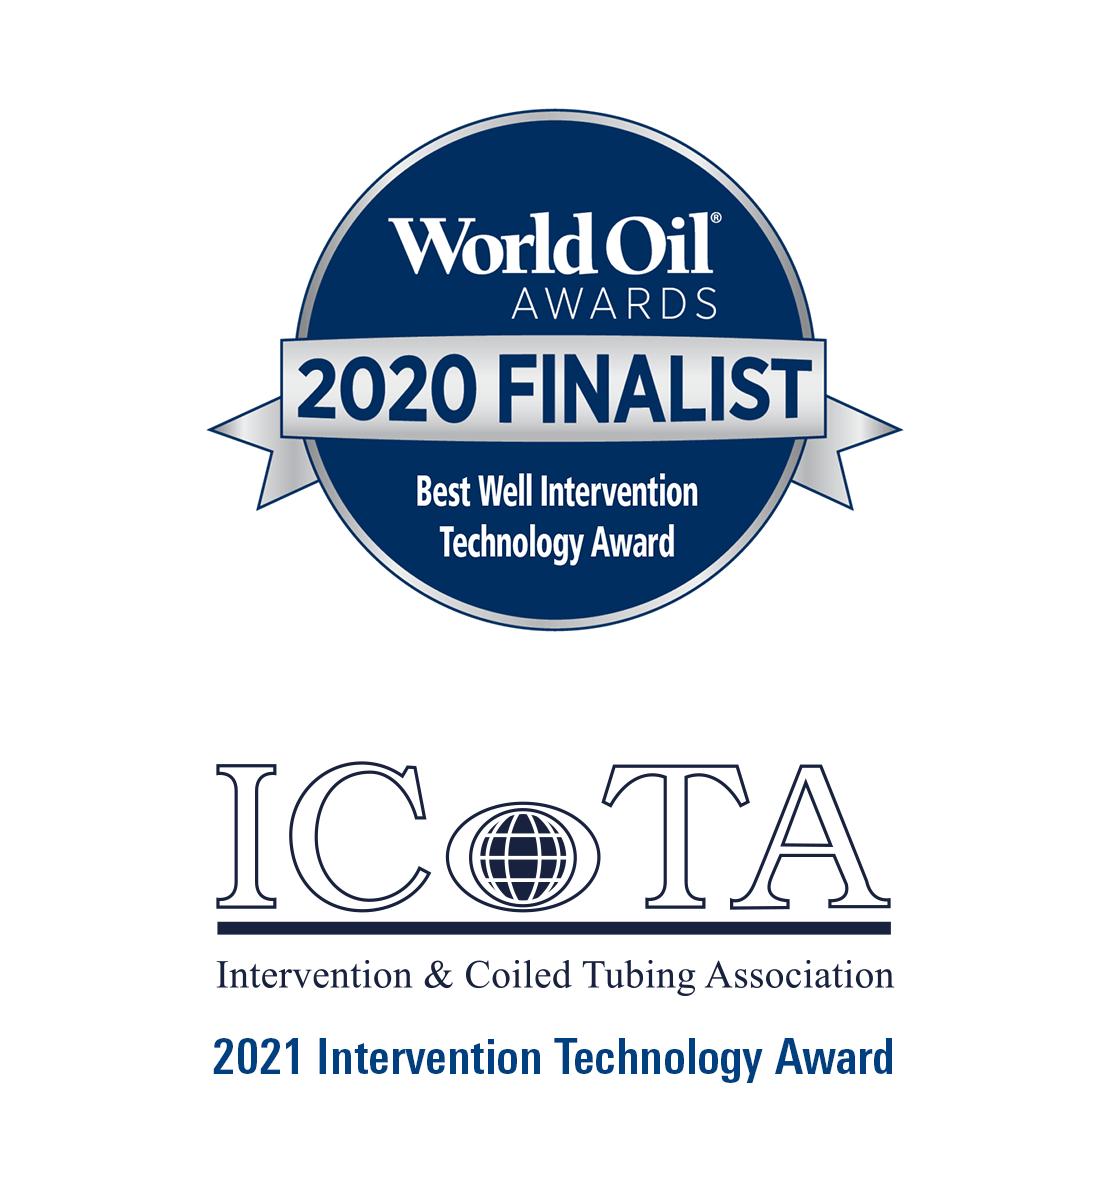 Schlumberger wins 2020 World Oil Best Well Intervention Technology Award and 2021 ICoTA Intervention Technology Award